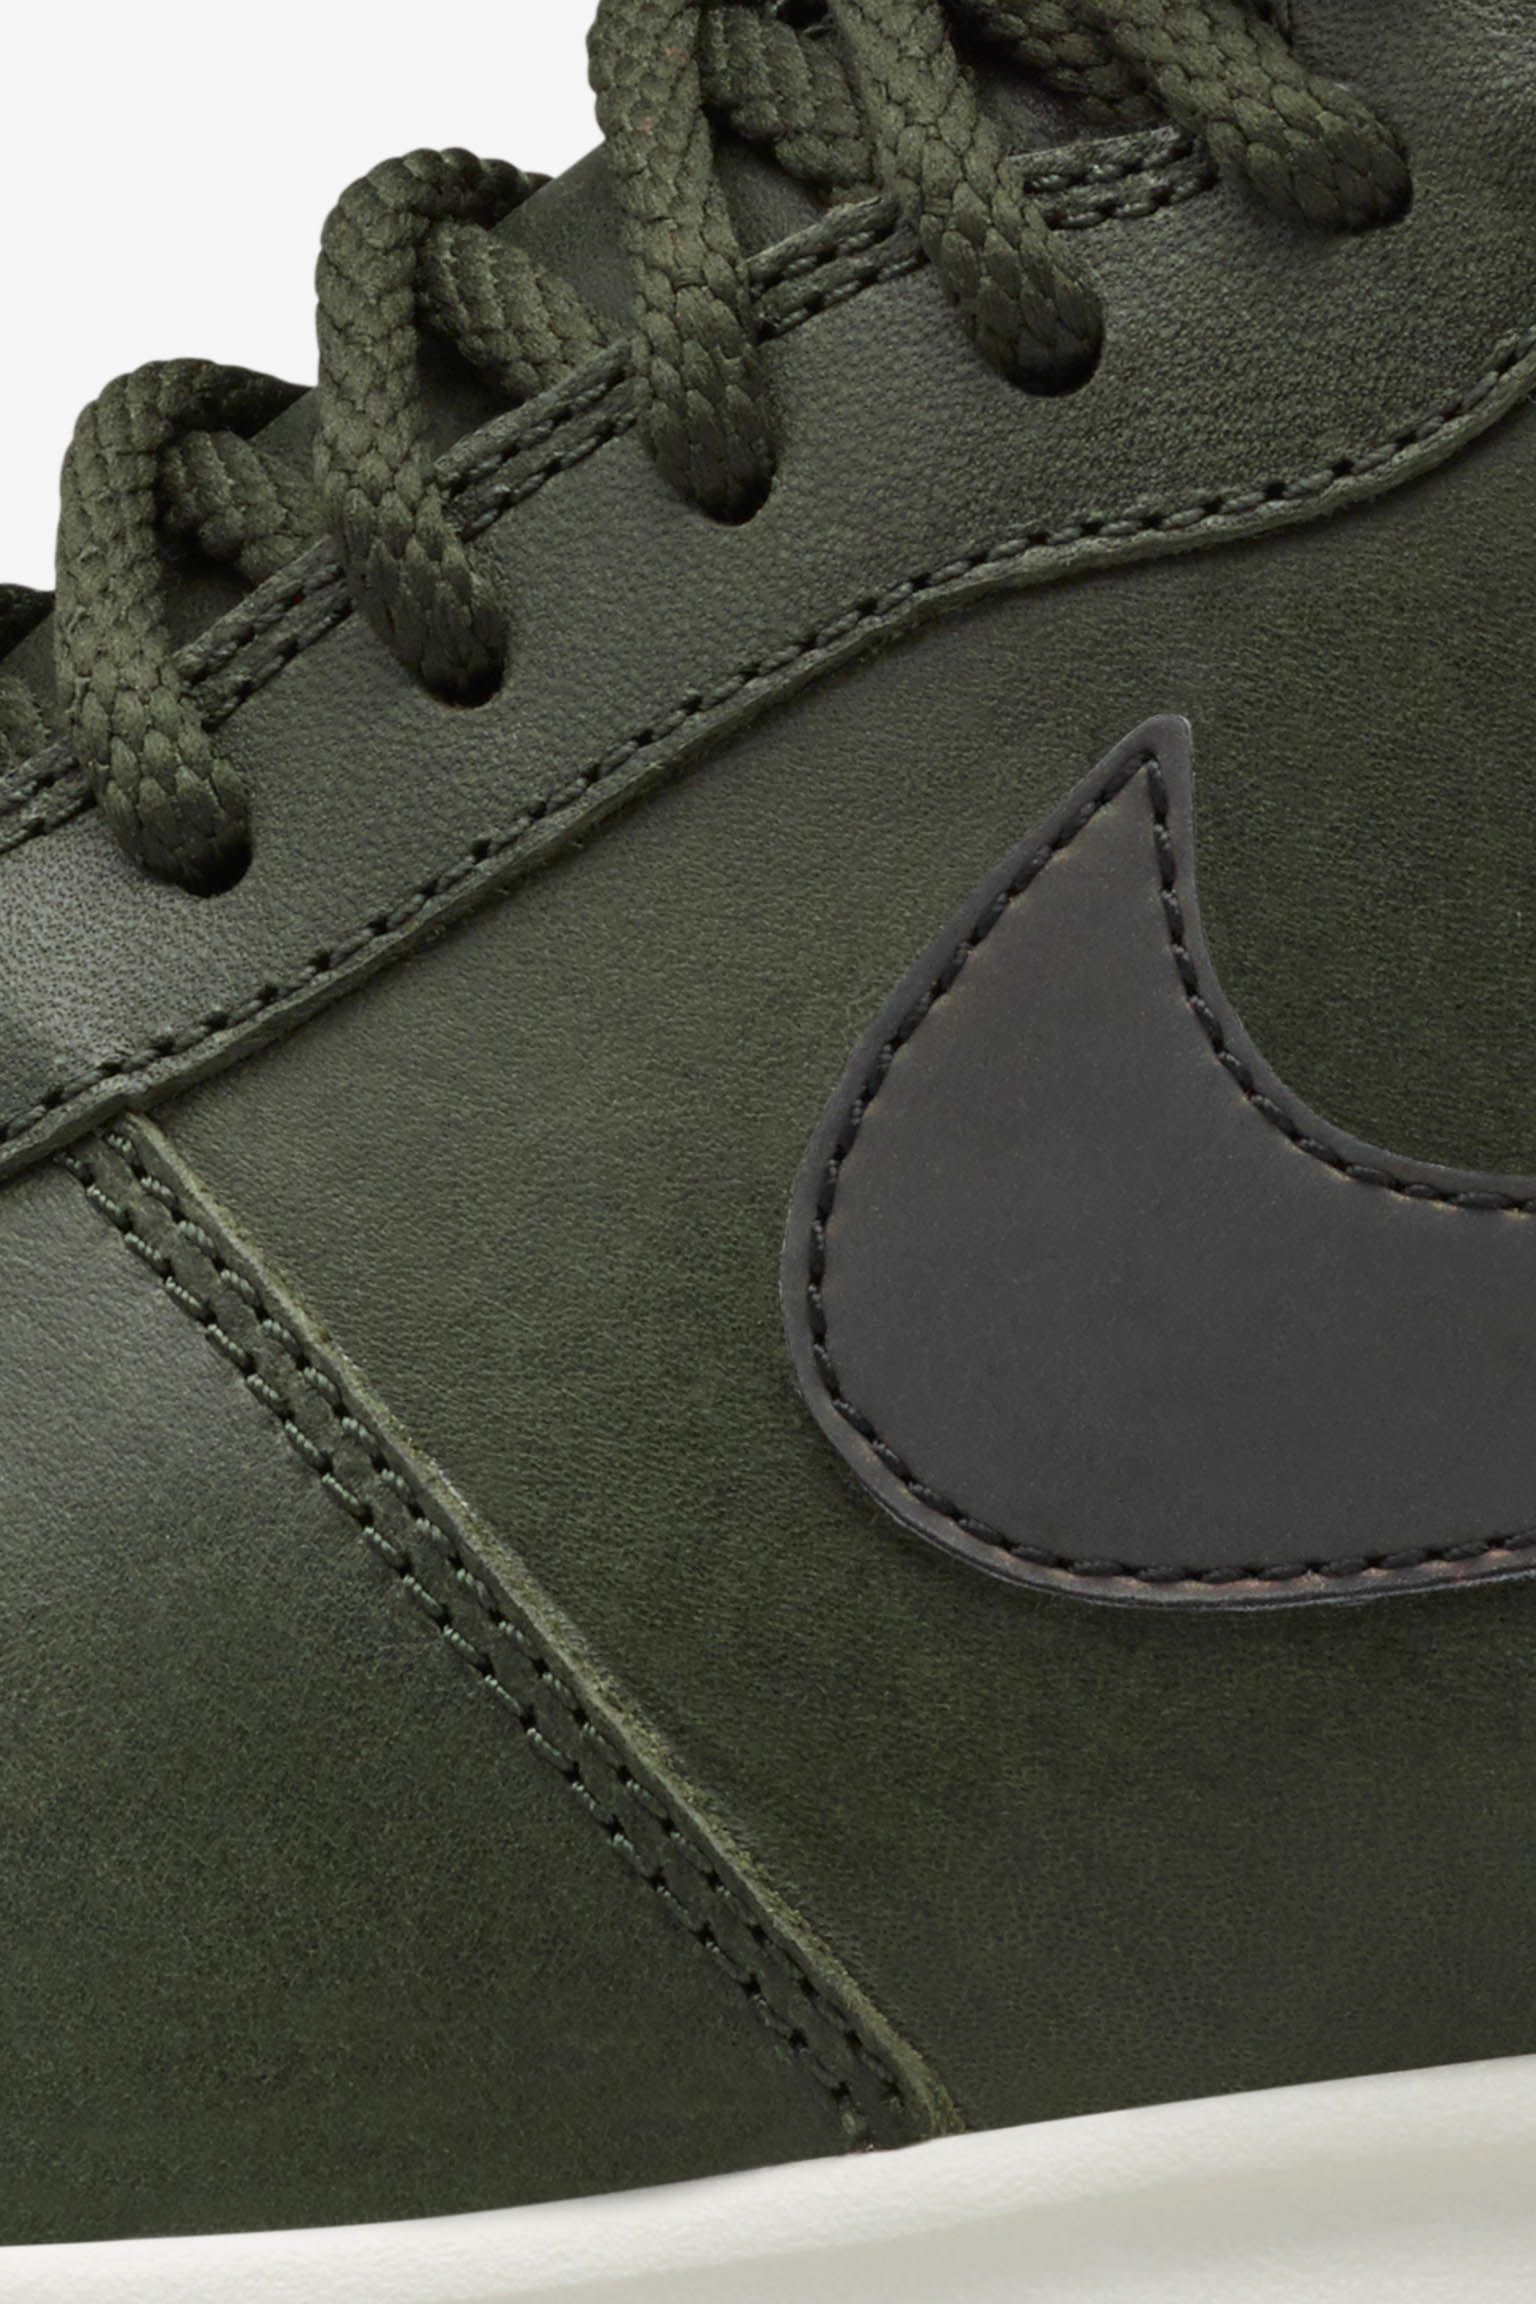 Women's Nike Acorra Sneakerboots 'Sequoia & Menta'